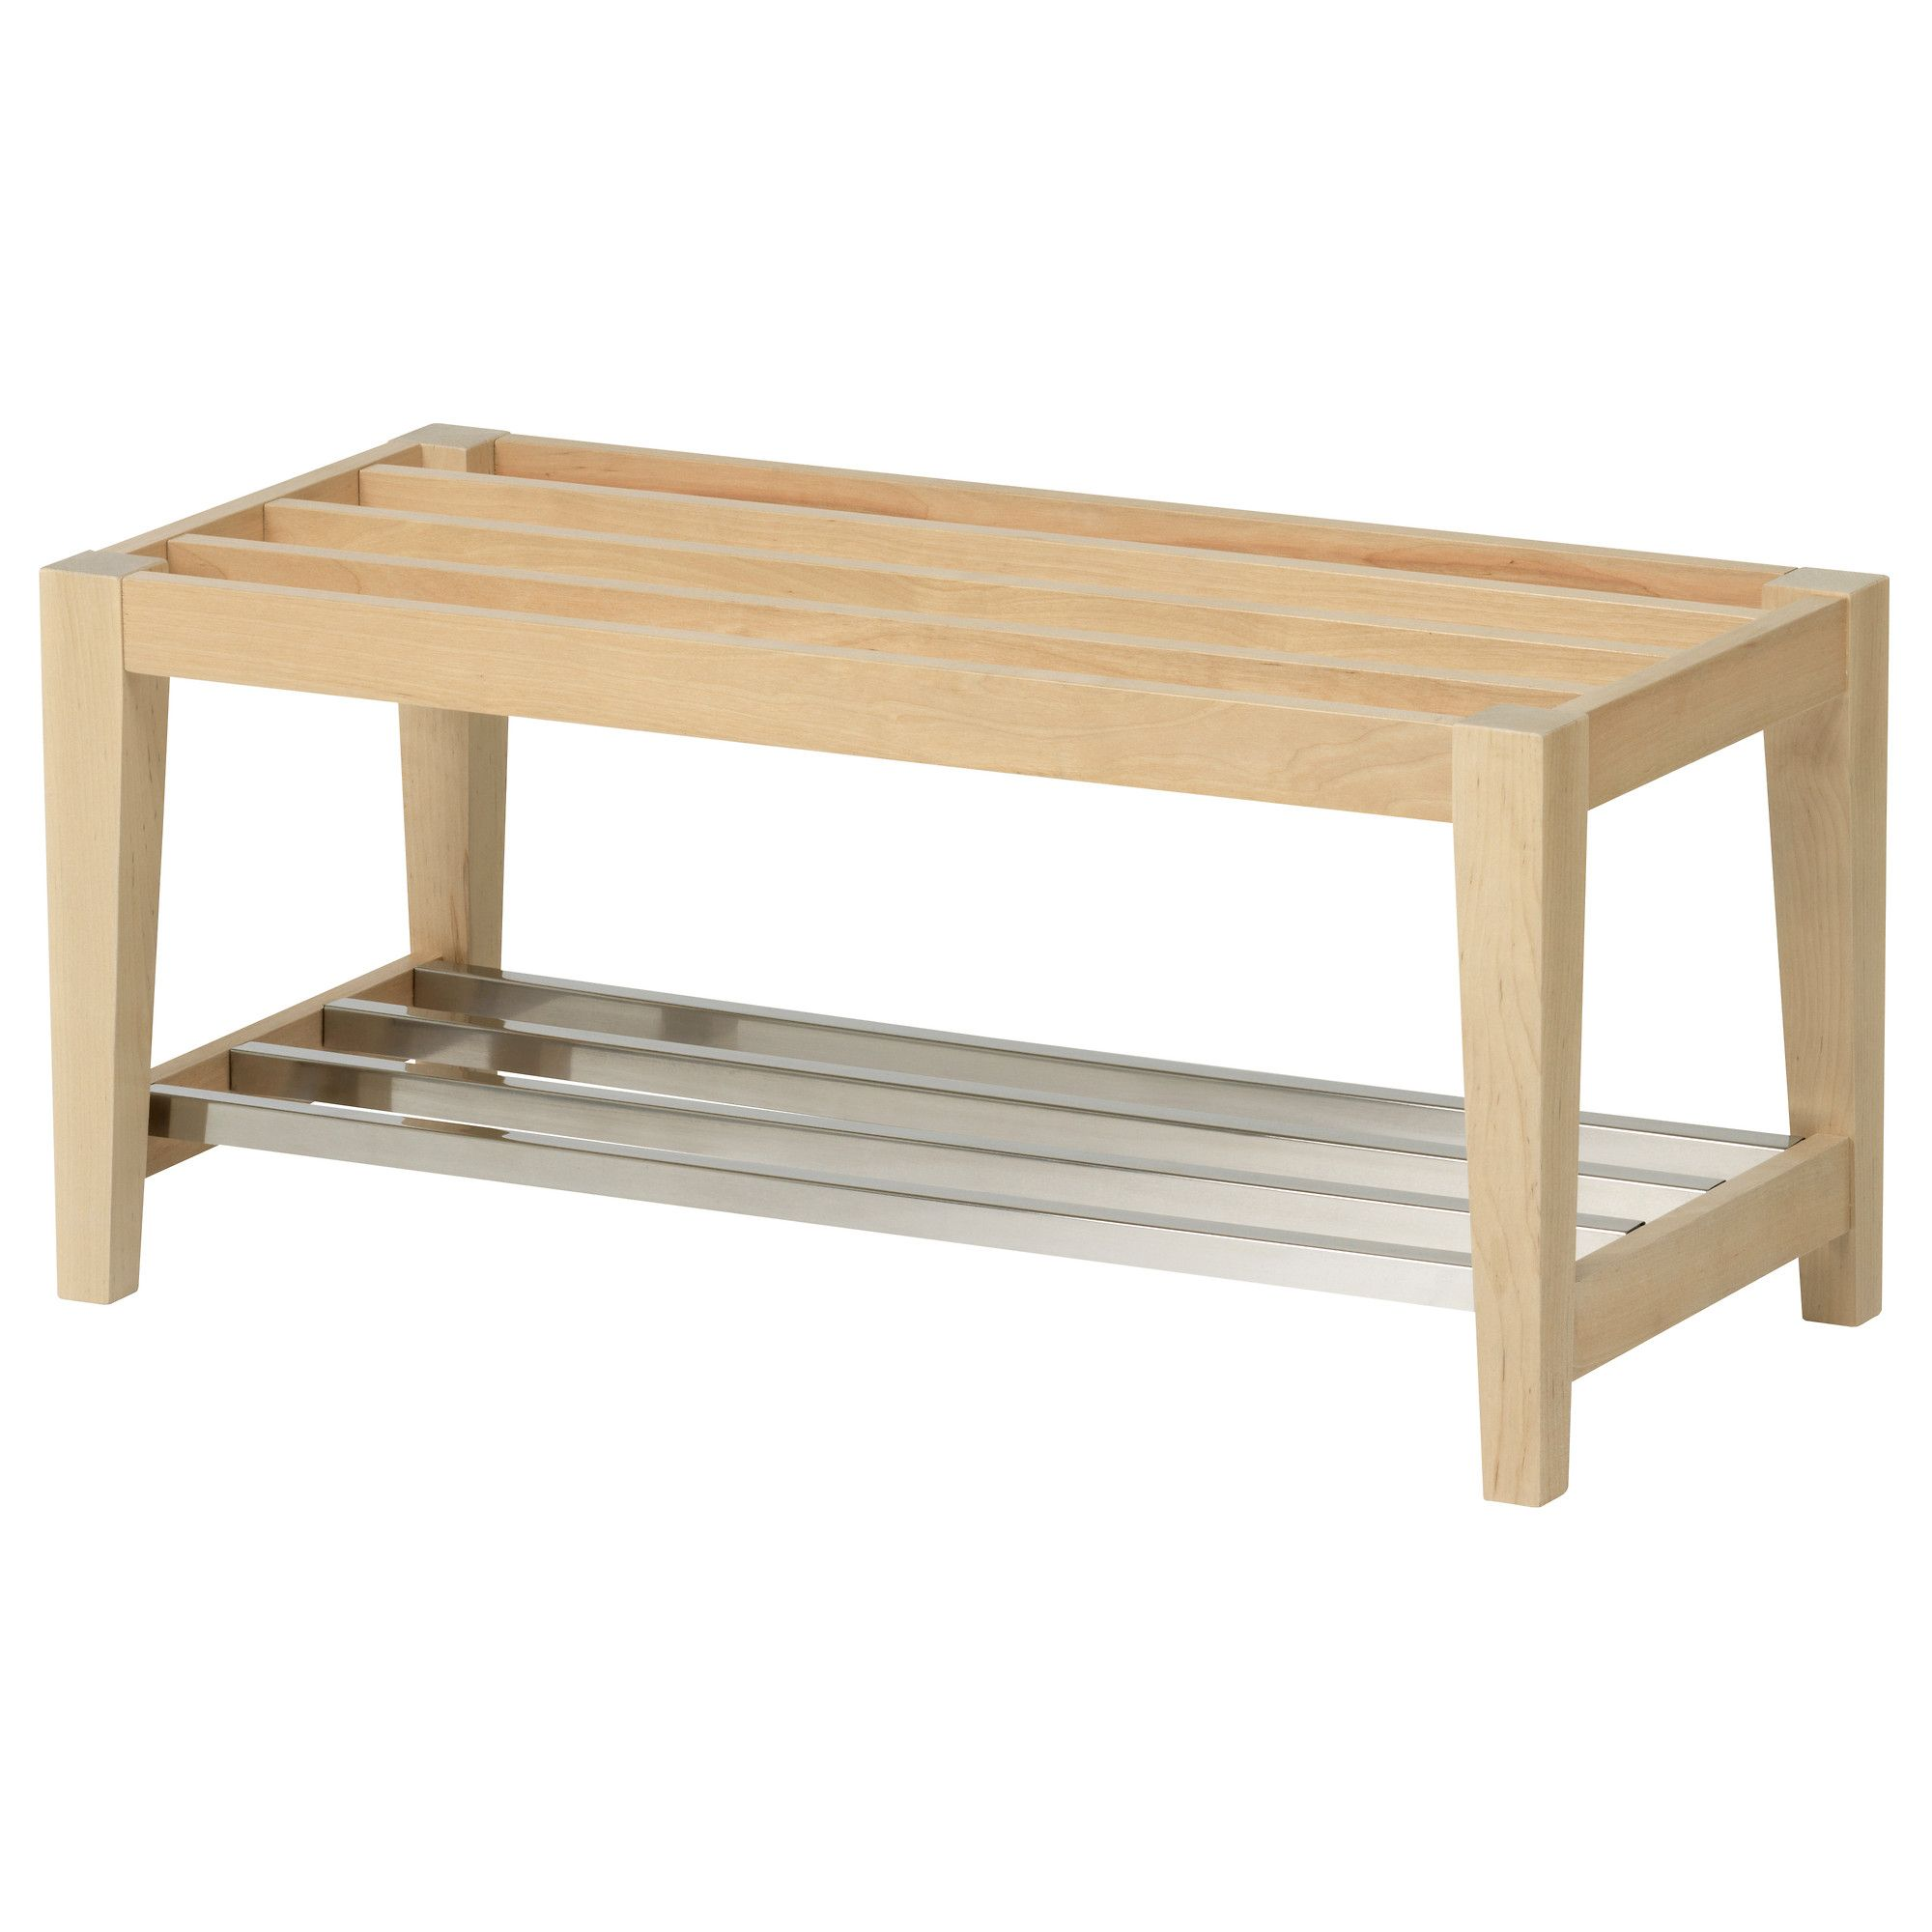 Ikea Australia Affordable Swedish Home Furniture Ikea Shoe Rack Ikea Shoe Rack Room